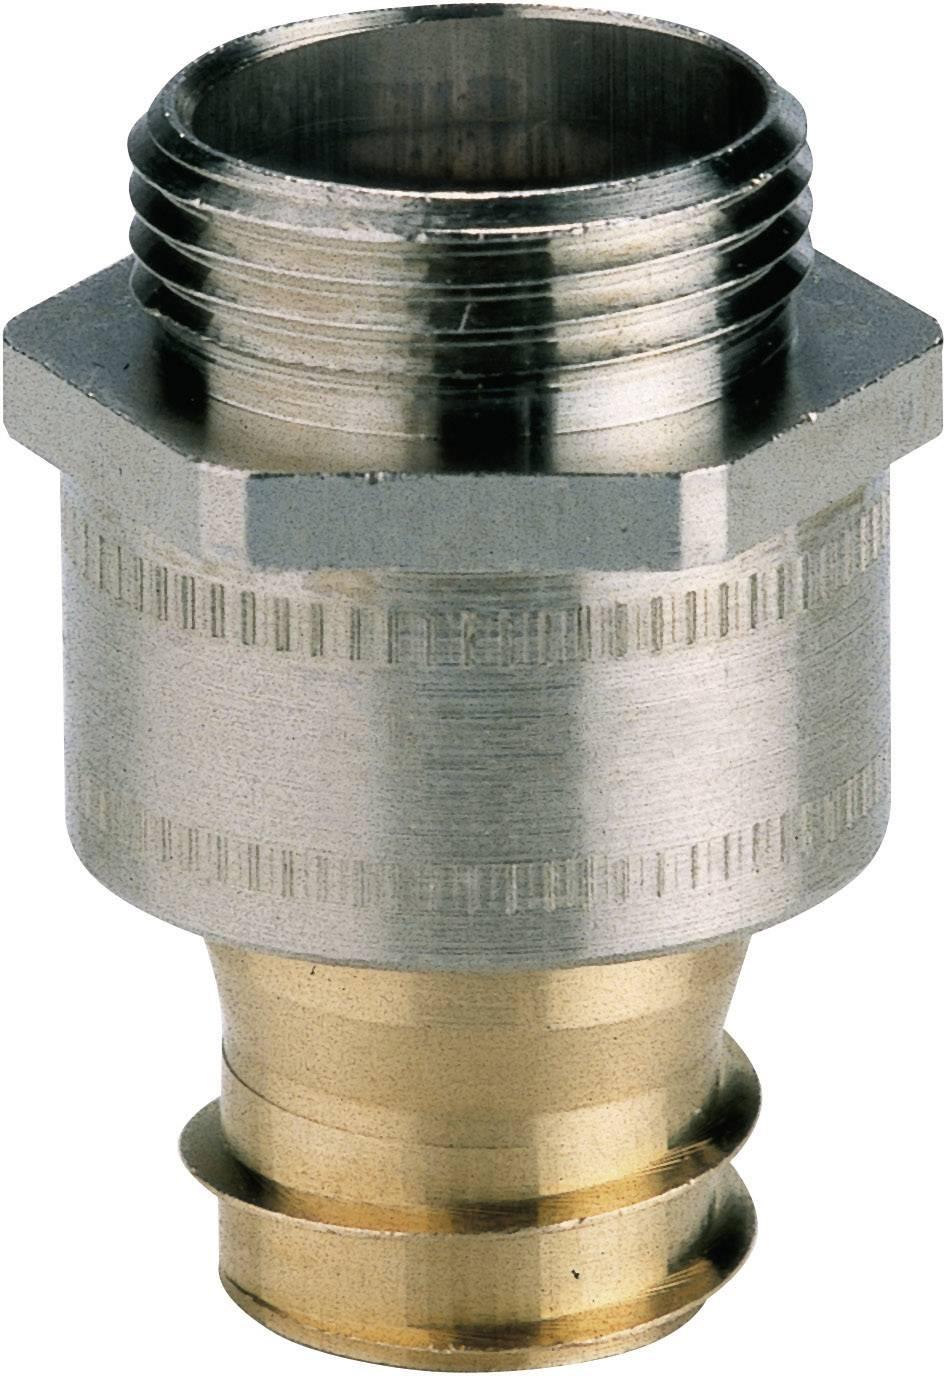 Hadicová spojka rovná LappKabel SILVYN® LI-M 25x1,5 SGY 61802373, M25, stříbrná, 1 ks